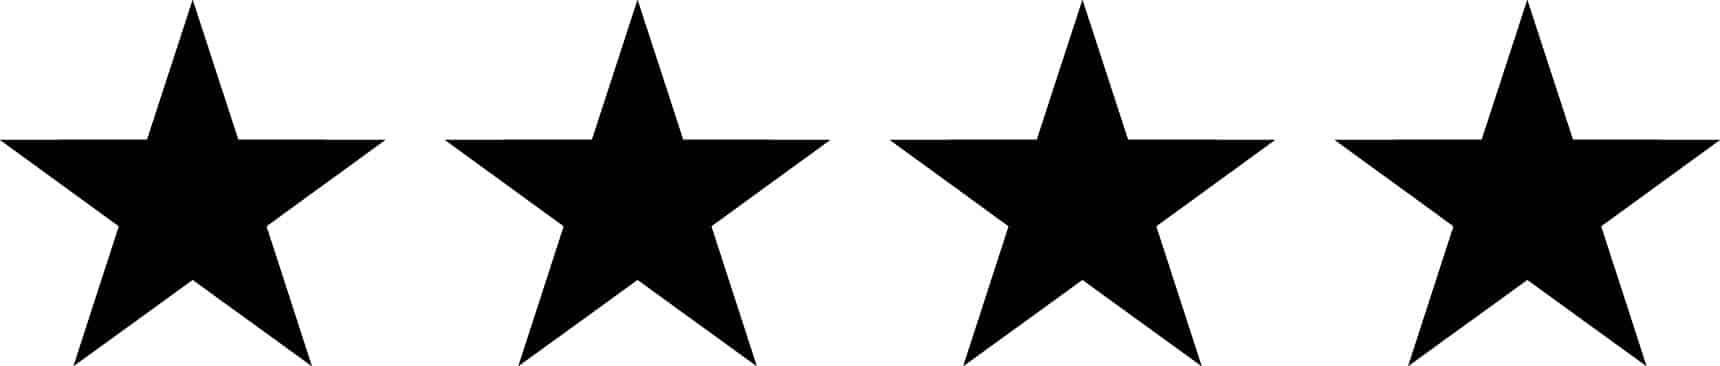 Four black stars in a row